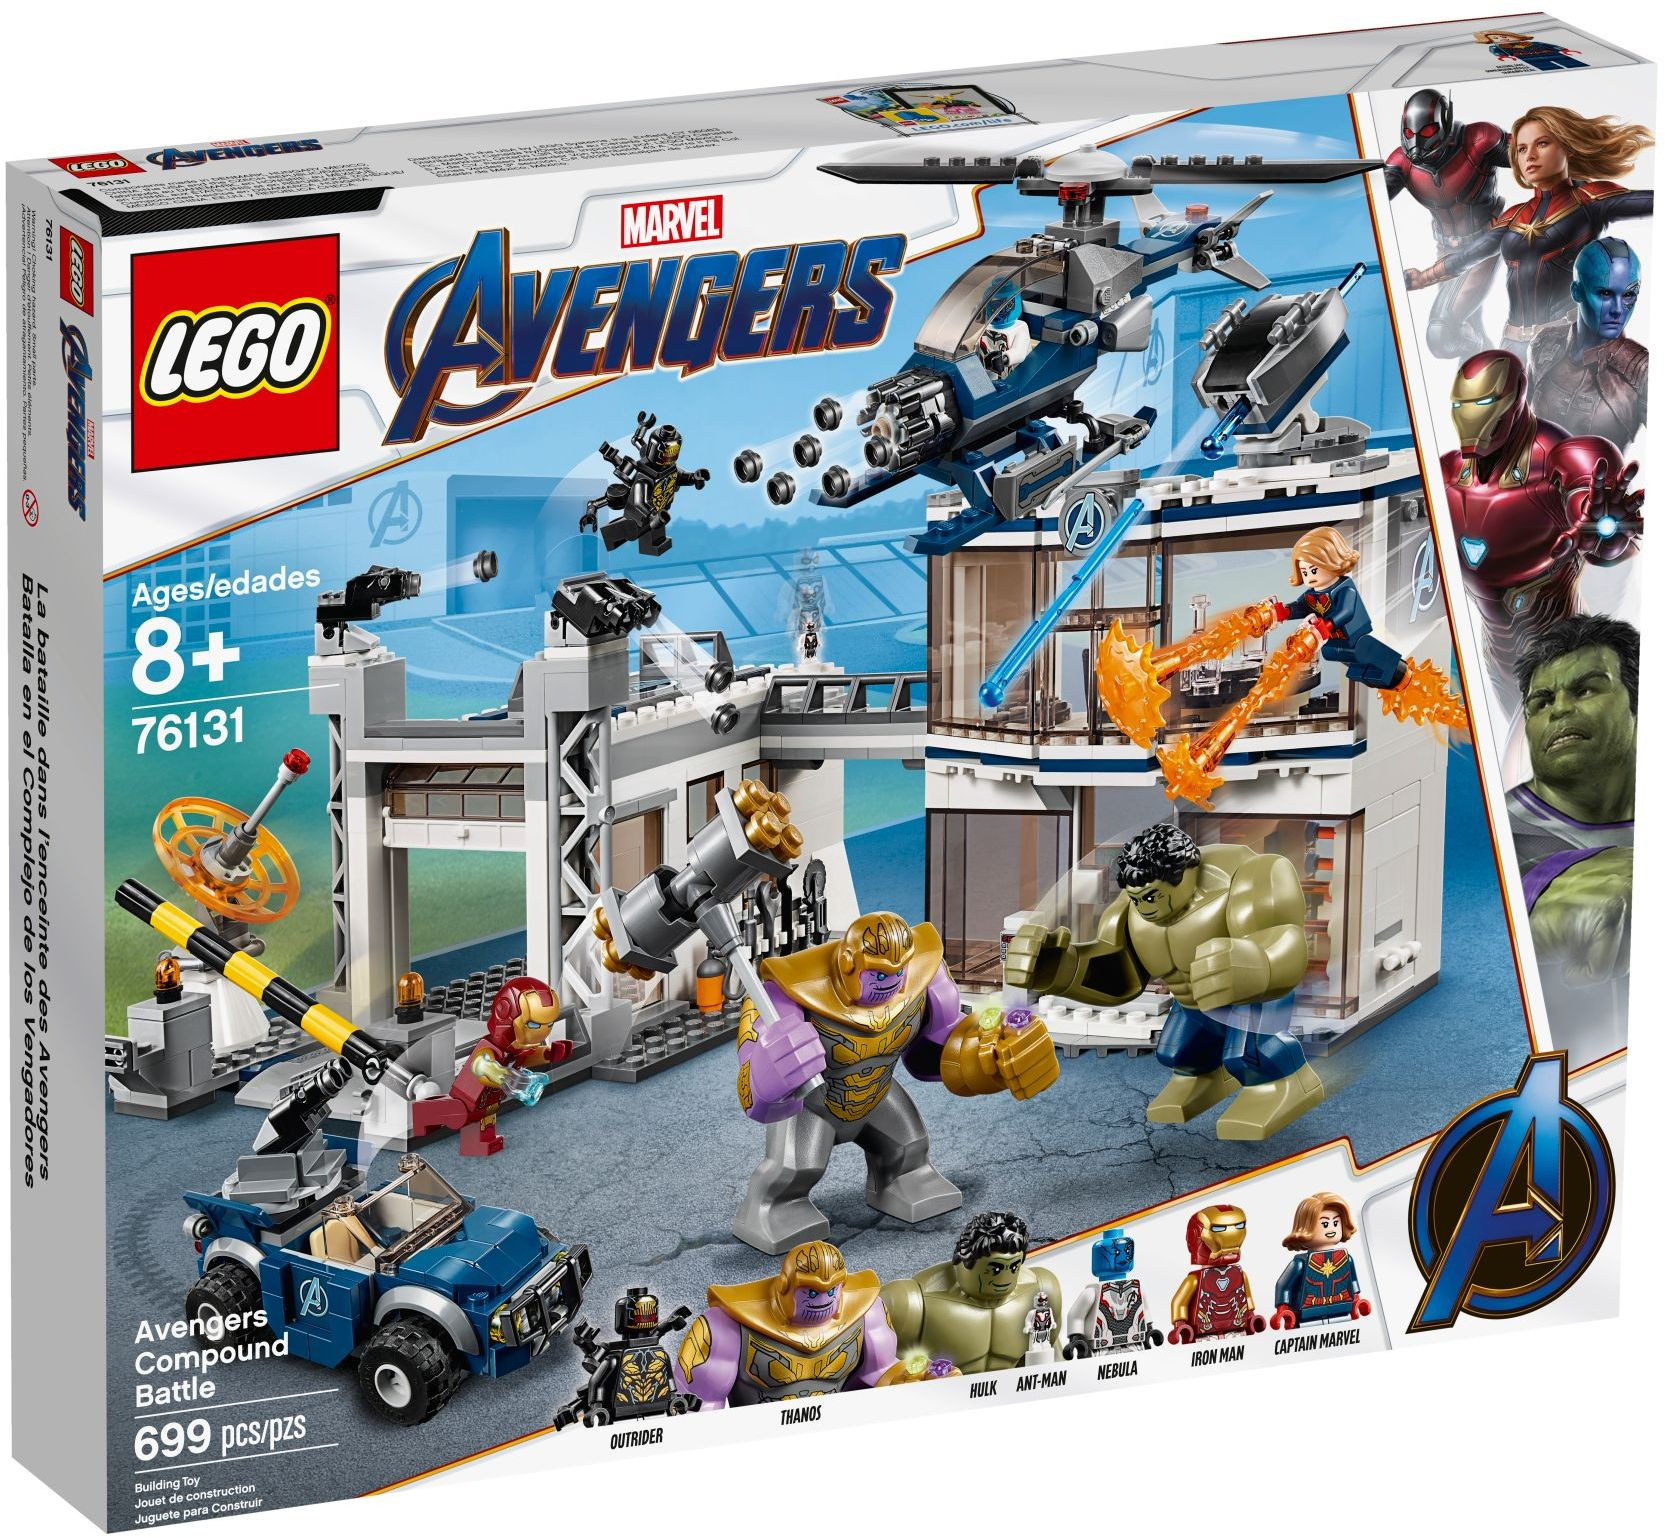 LEGO AVENGERS COMPOUND BATTLE - 76131